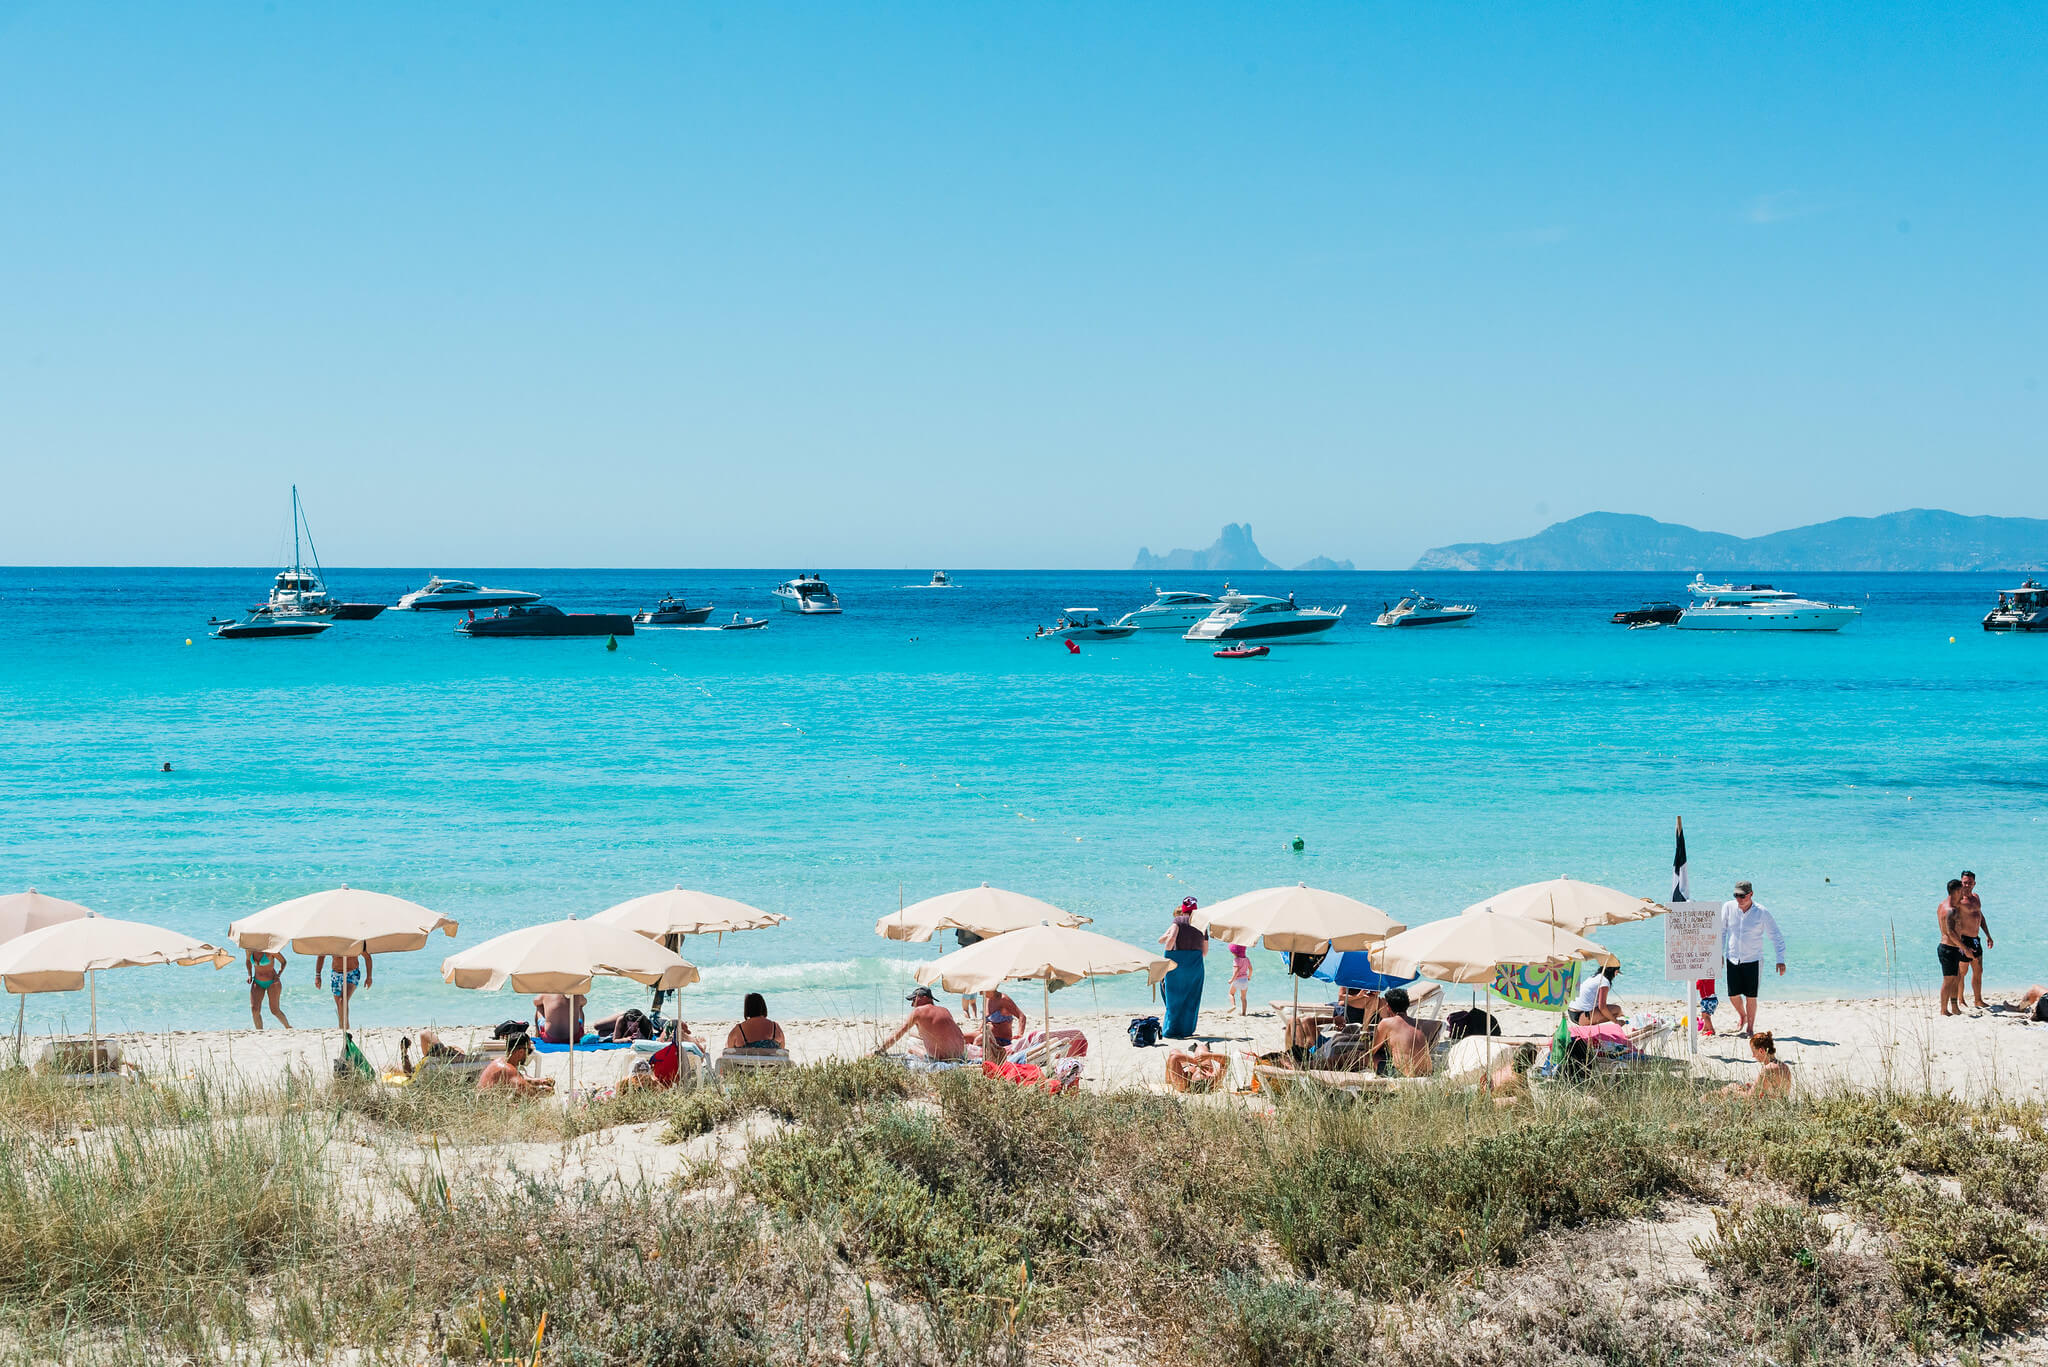 https://www.white-ibiza.com/wp-content/uploads/2020/04/formentera-beaches-illetes-2020-02.jpg